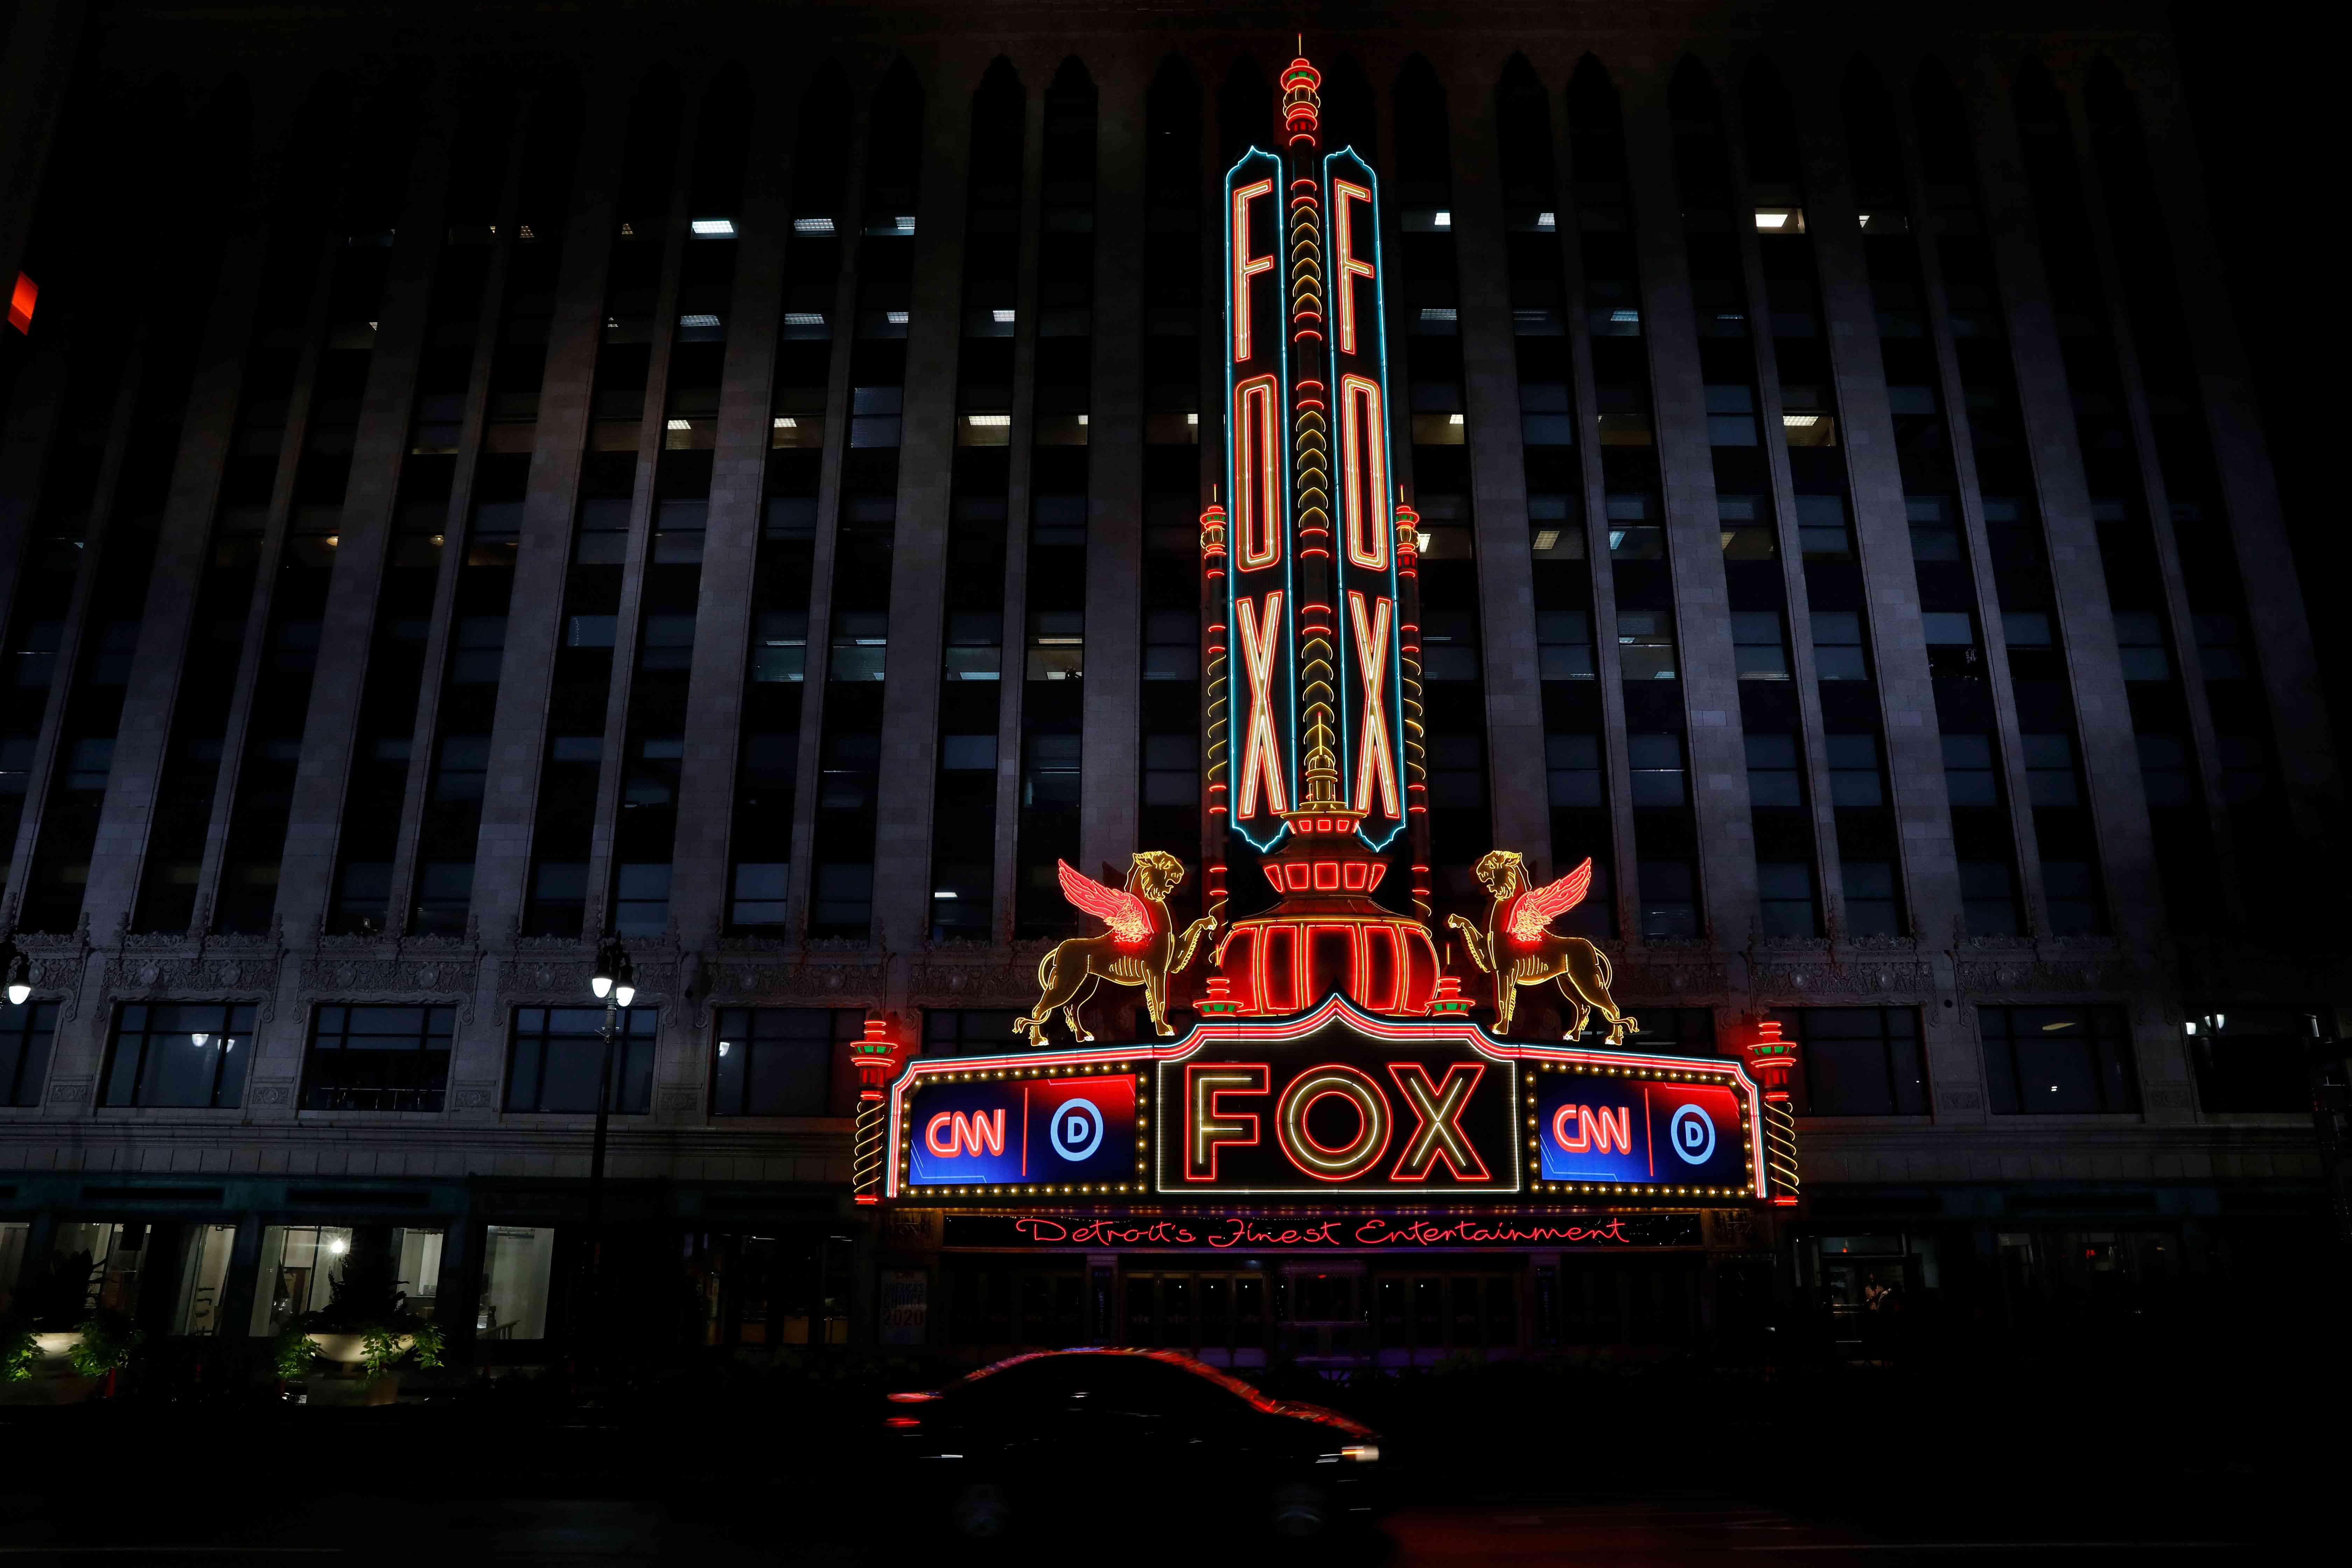 Detroit Fox Theatre at night